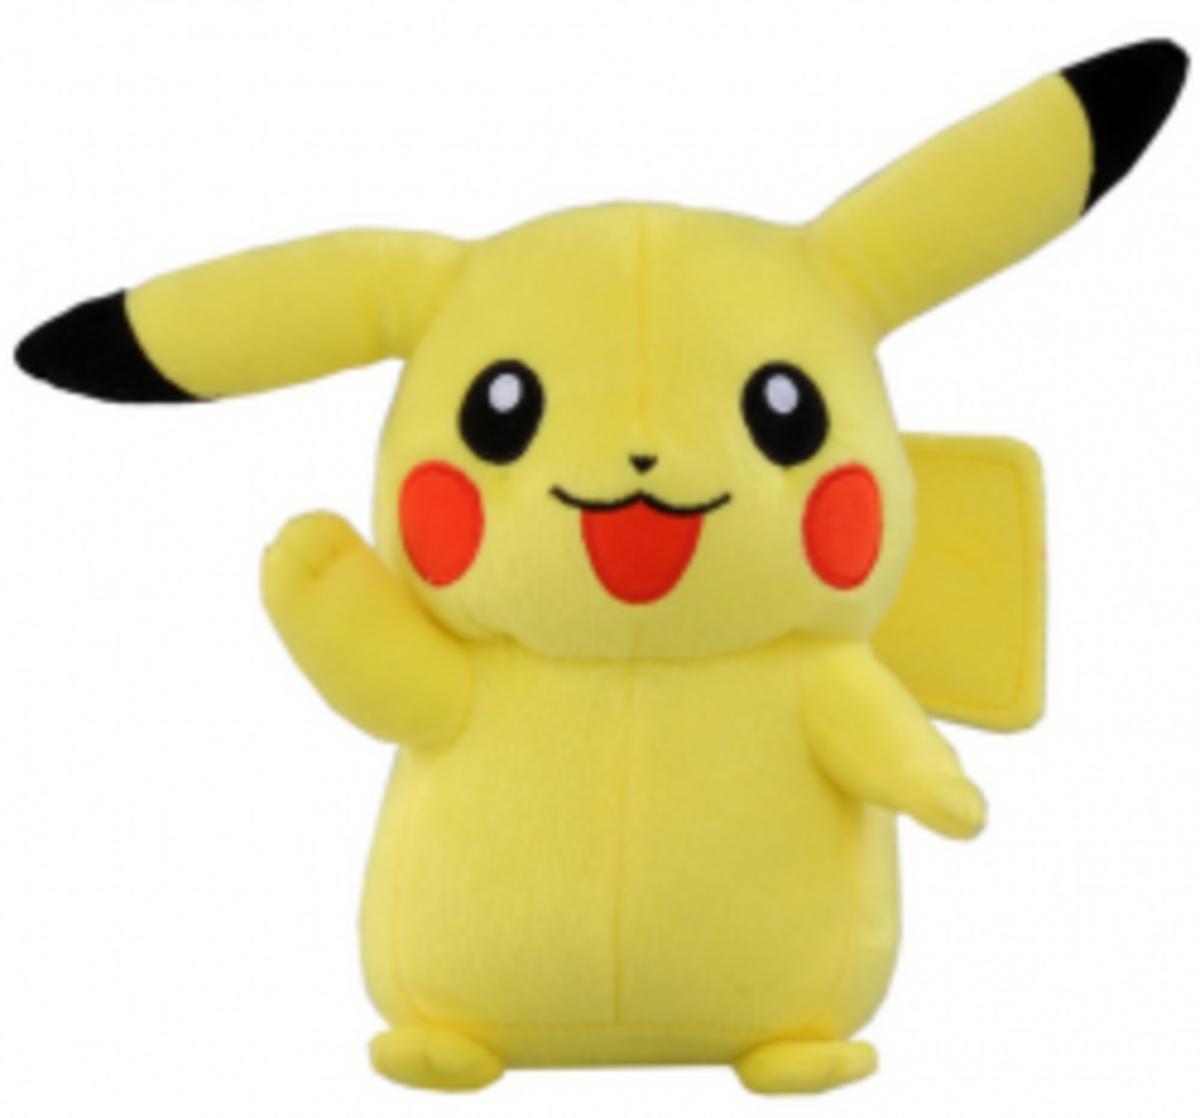 14 Games Like Pokémon